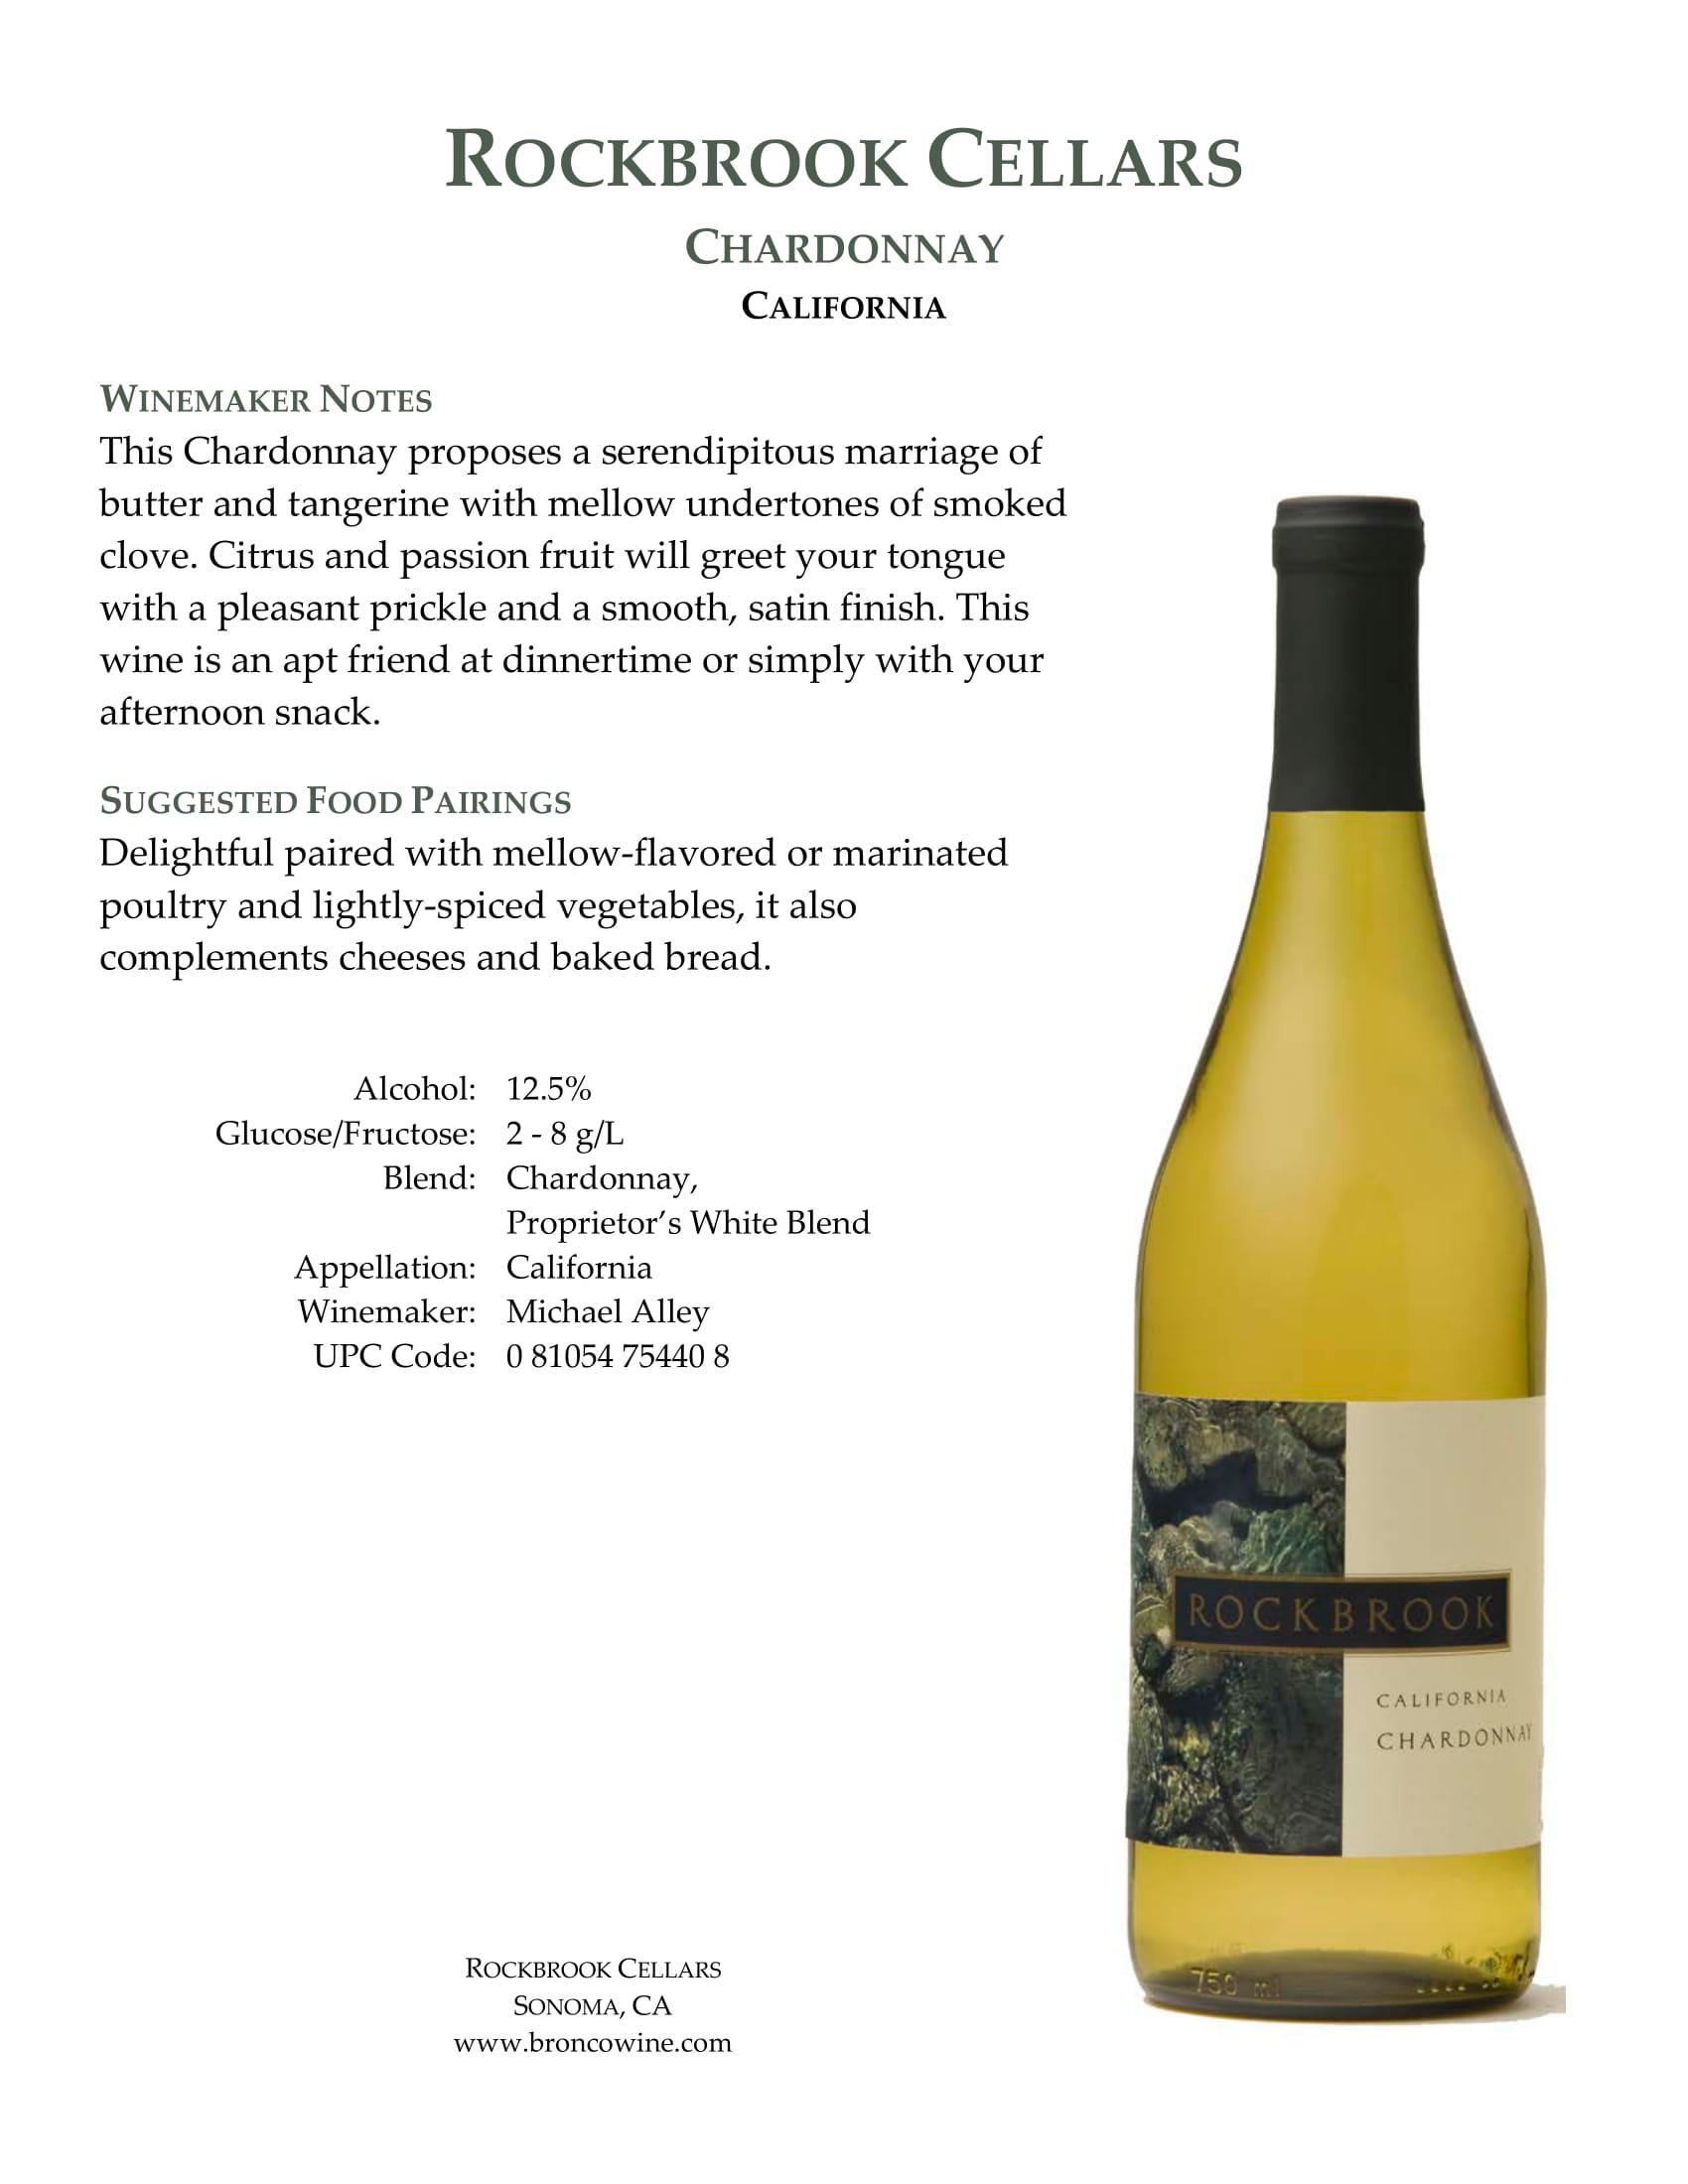 Rockbrook Cellars Chardonnay Tech Sheet